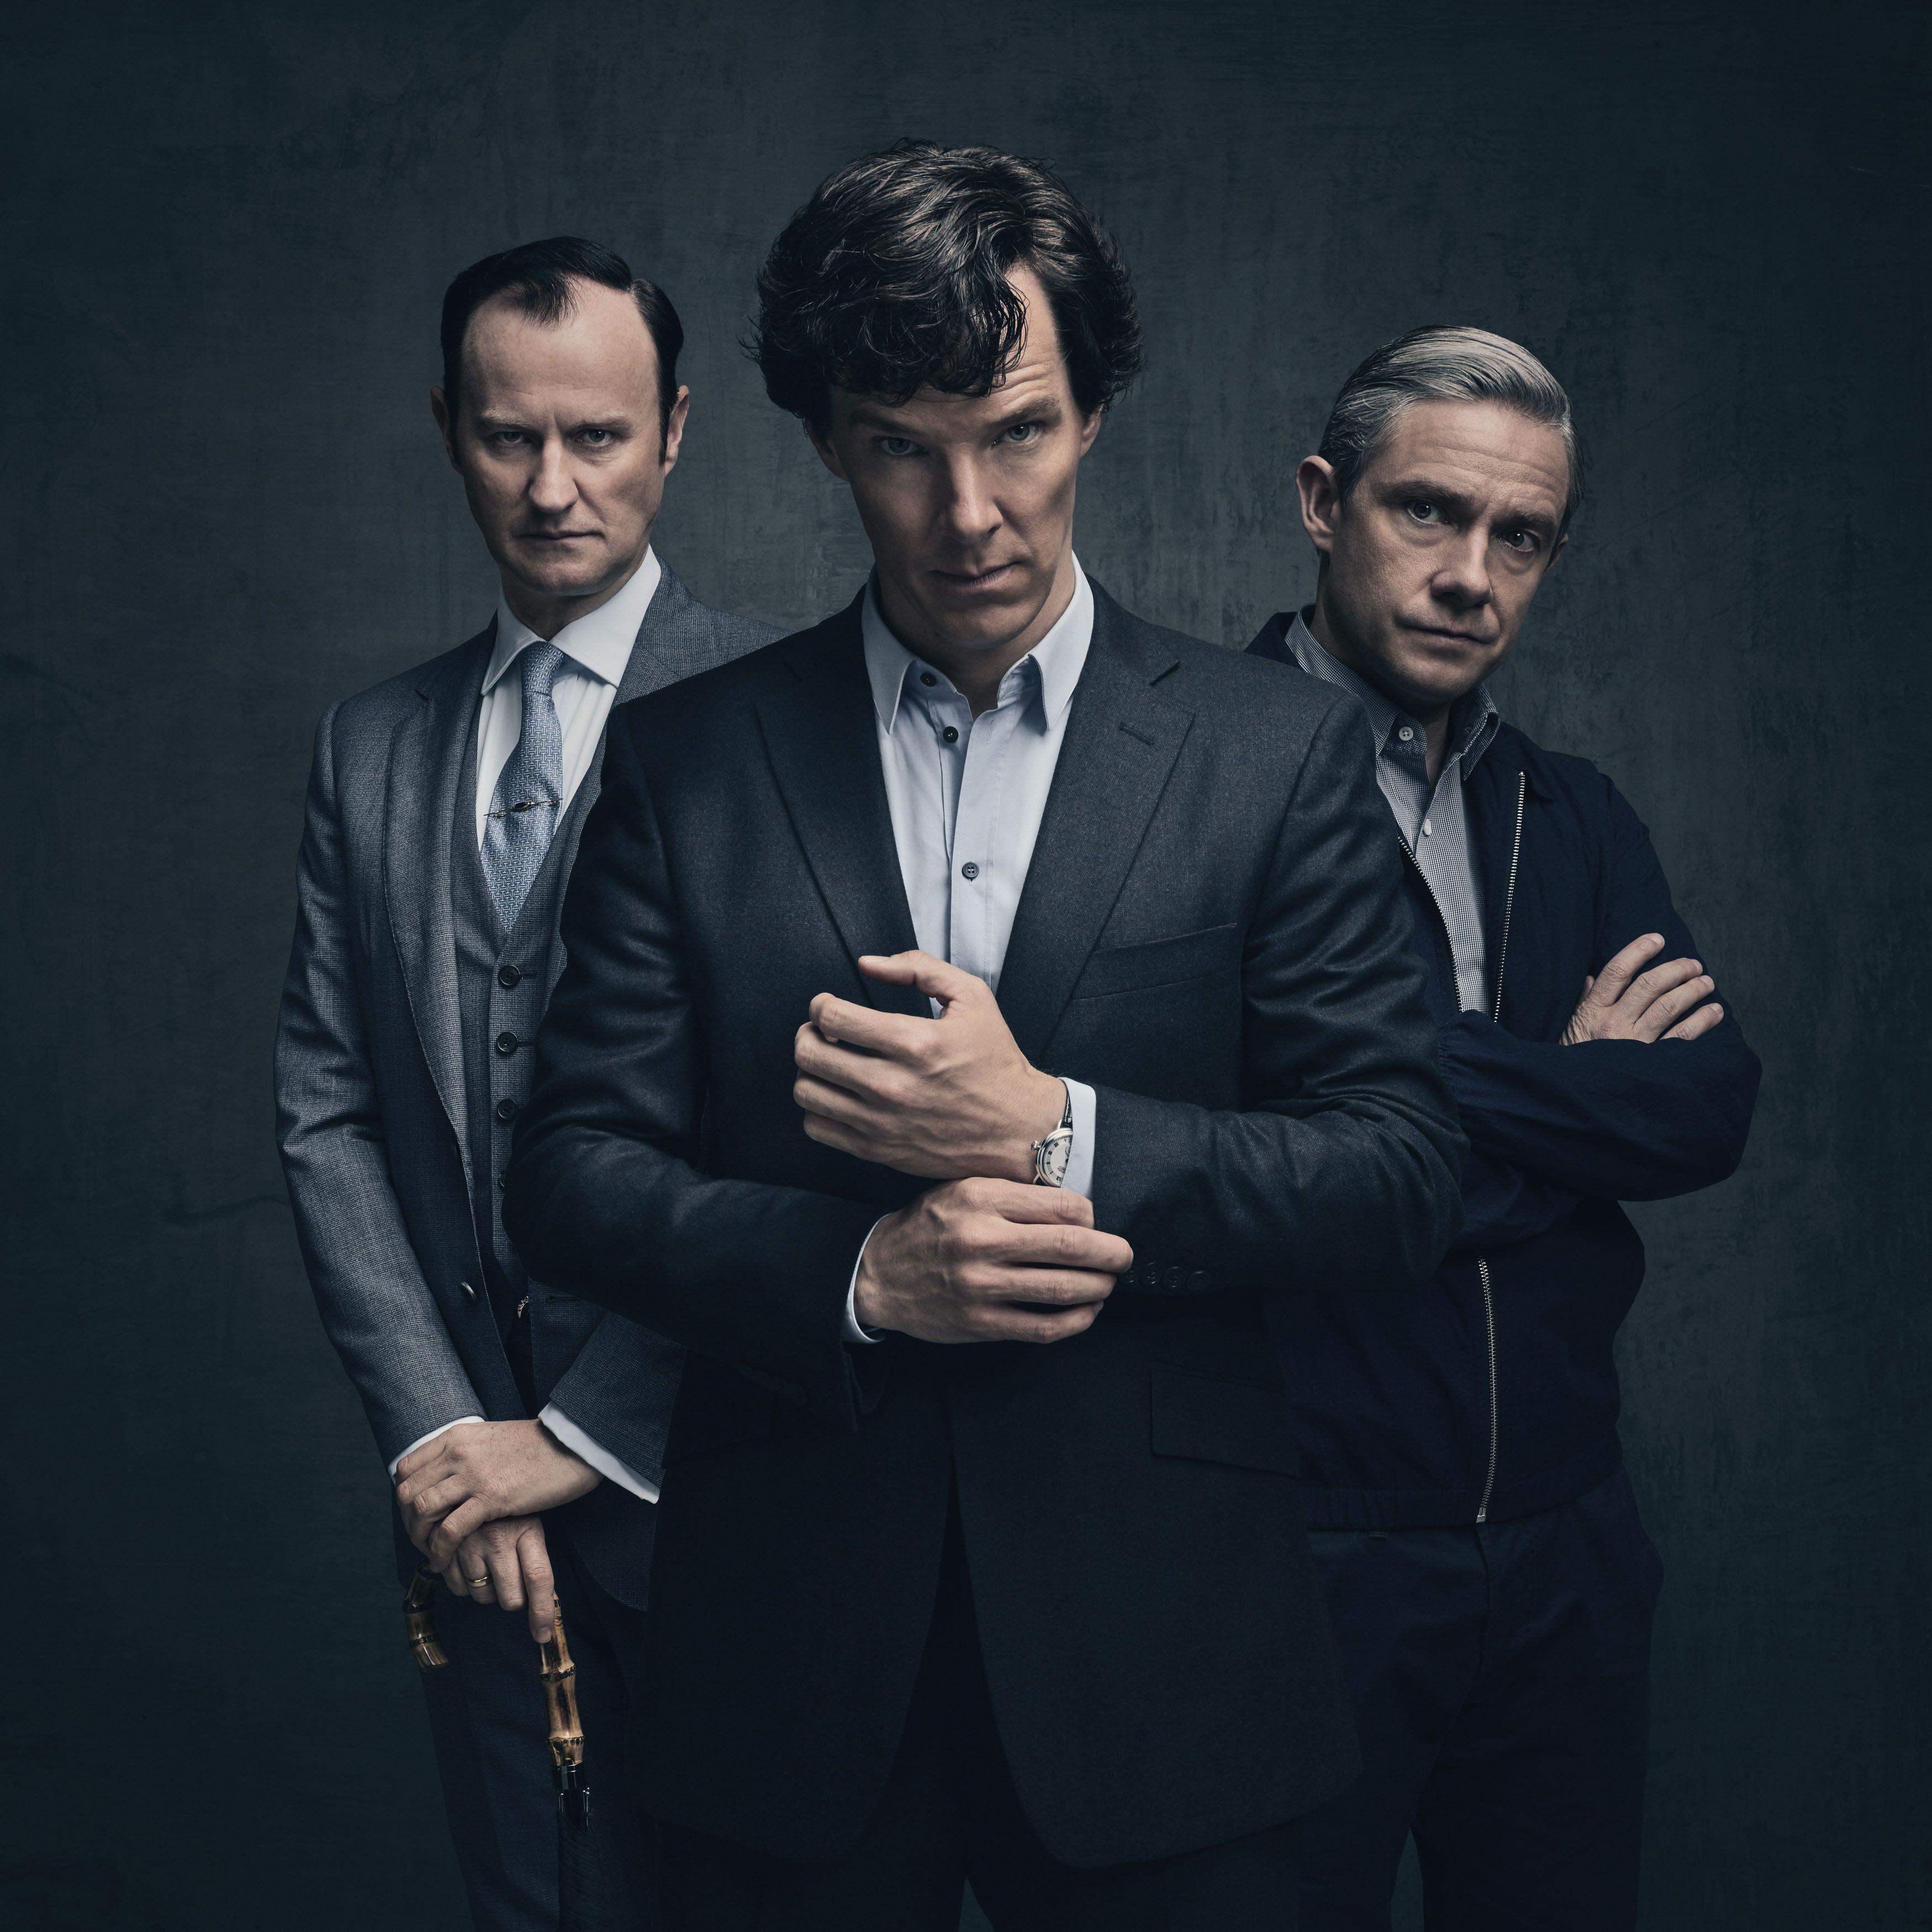 Hd Wallpaper Sherlock Holmes John Watson Sherlock Holmes Bbc